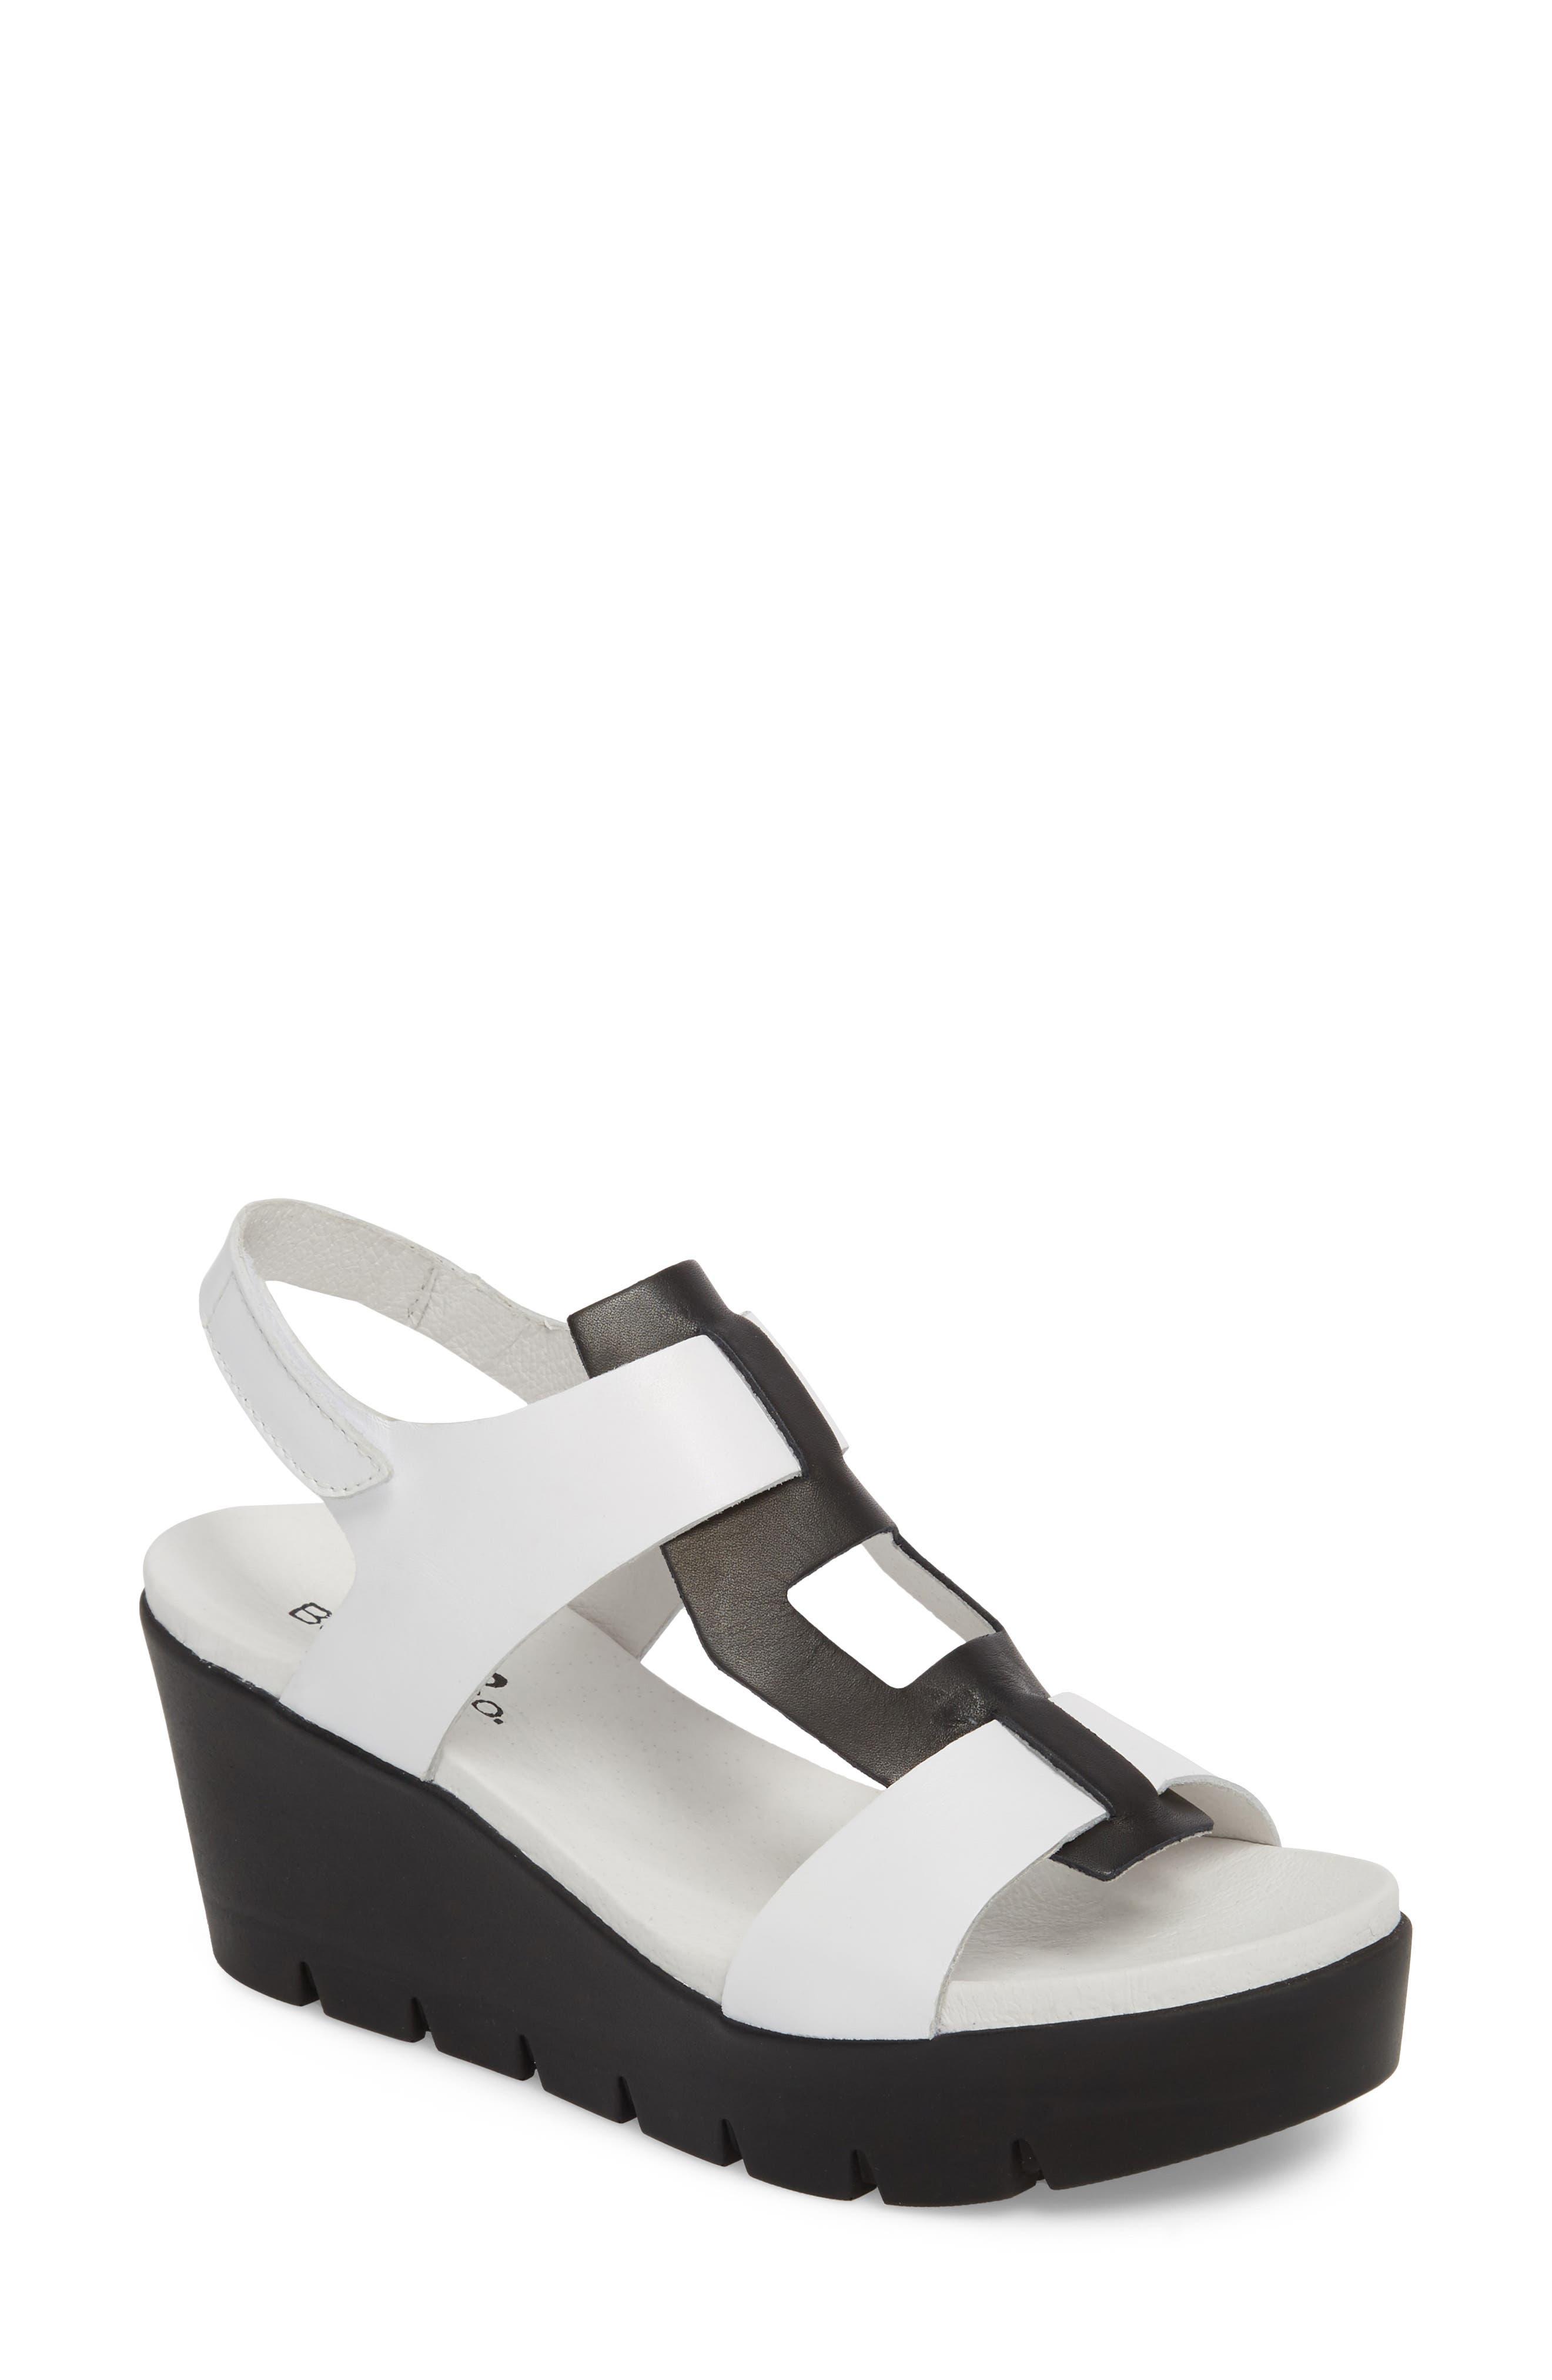 6d740a8dae656 Bos. & Co. Somo Platform Wedge Sandal, White